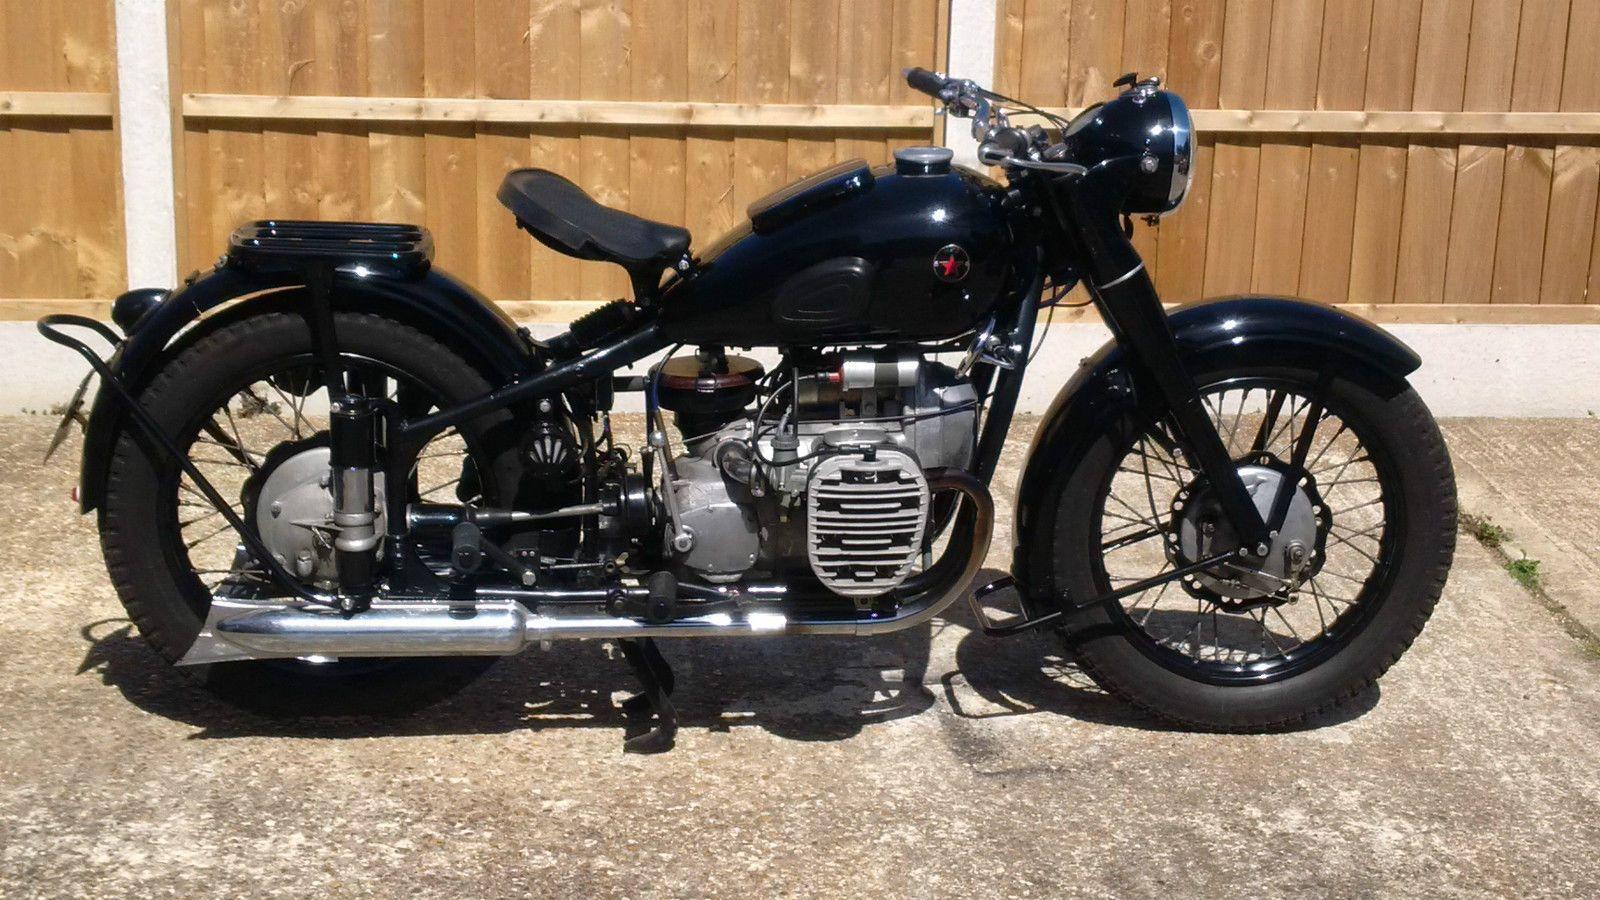 1956 Classic Ural IMZ M72 750cc sidevalve motorcycle | eBay